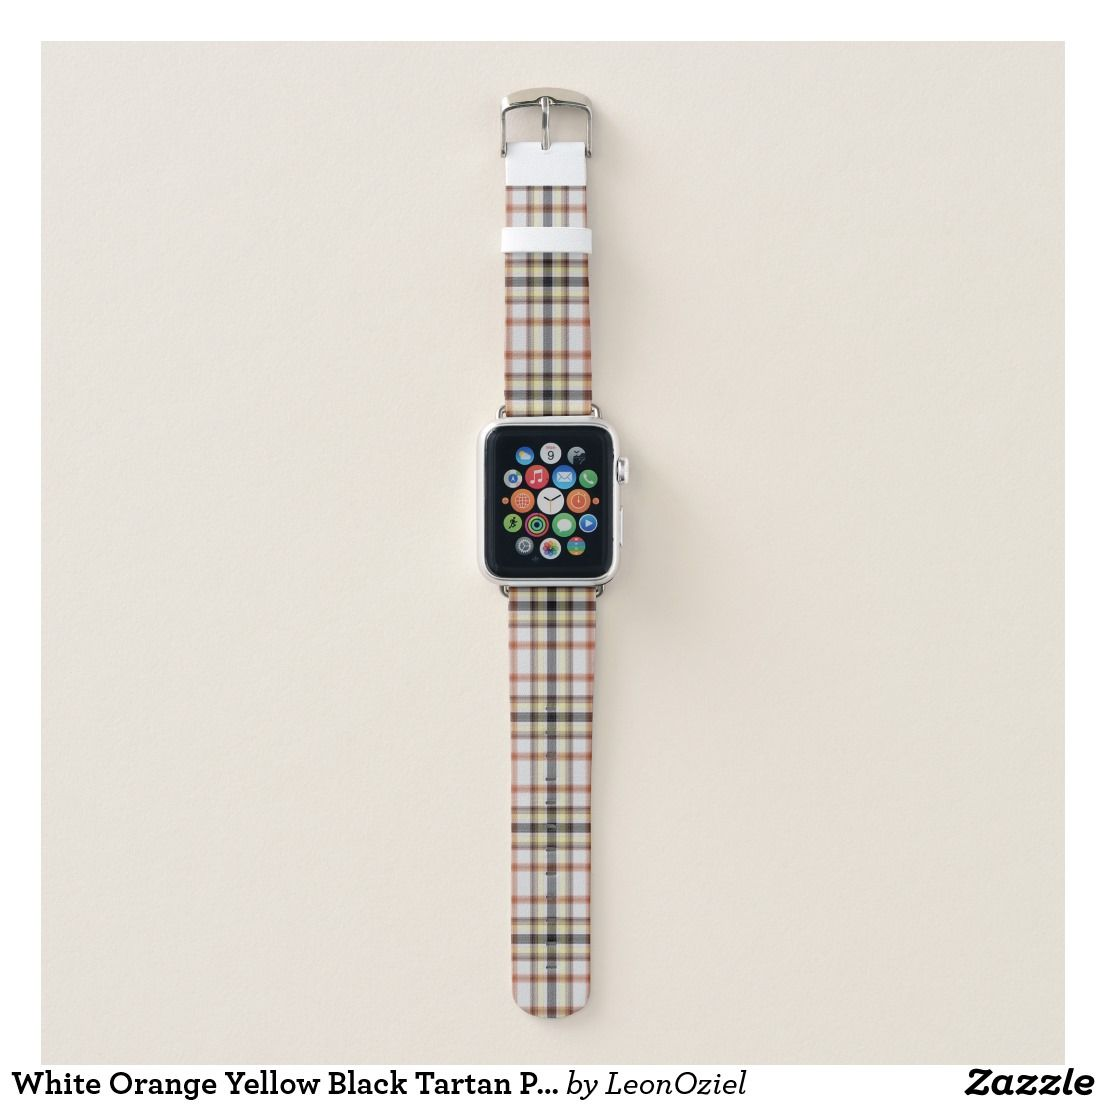 White Orange Yellow Black Tartan Plaid Apple Watch Band